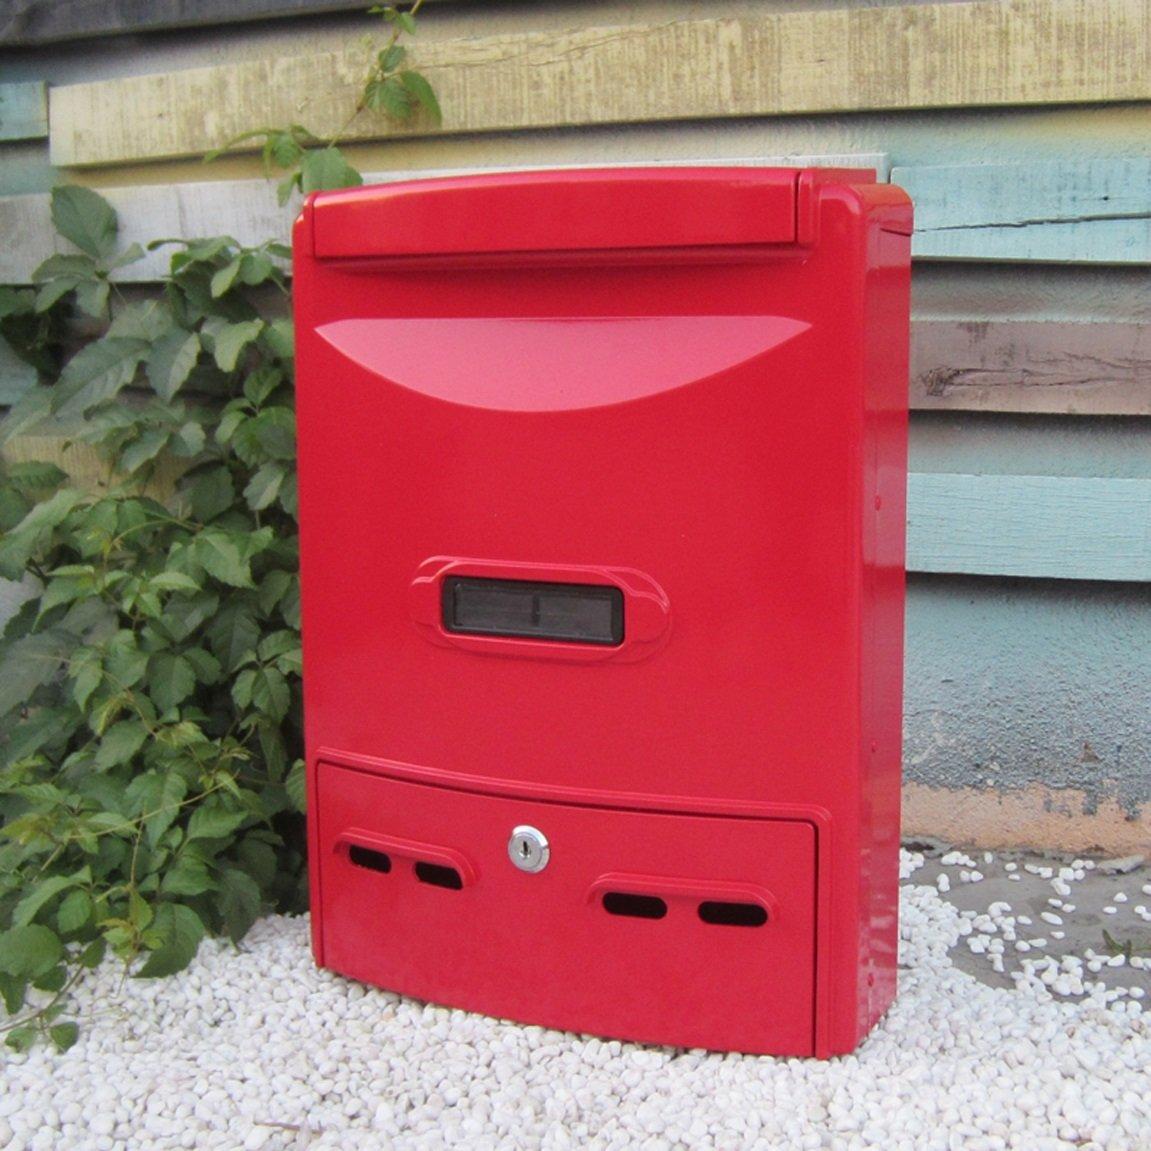 HZBc ヨーロッパの郵便箱防水屋外の郵便箱の提案箱の外壁コレクションボックス、壁の装飾、滑らかな赤   B07L7QBCVL